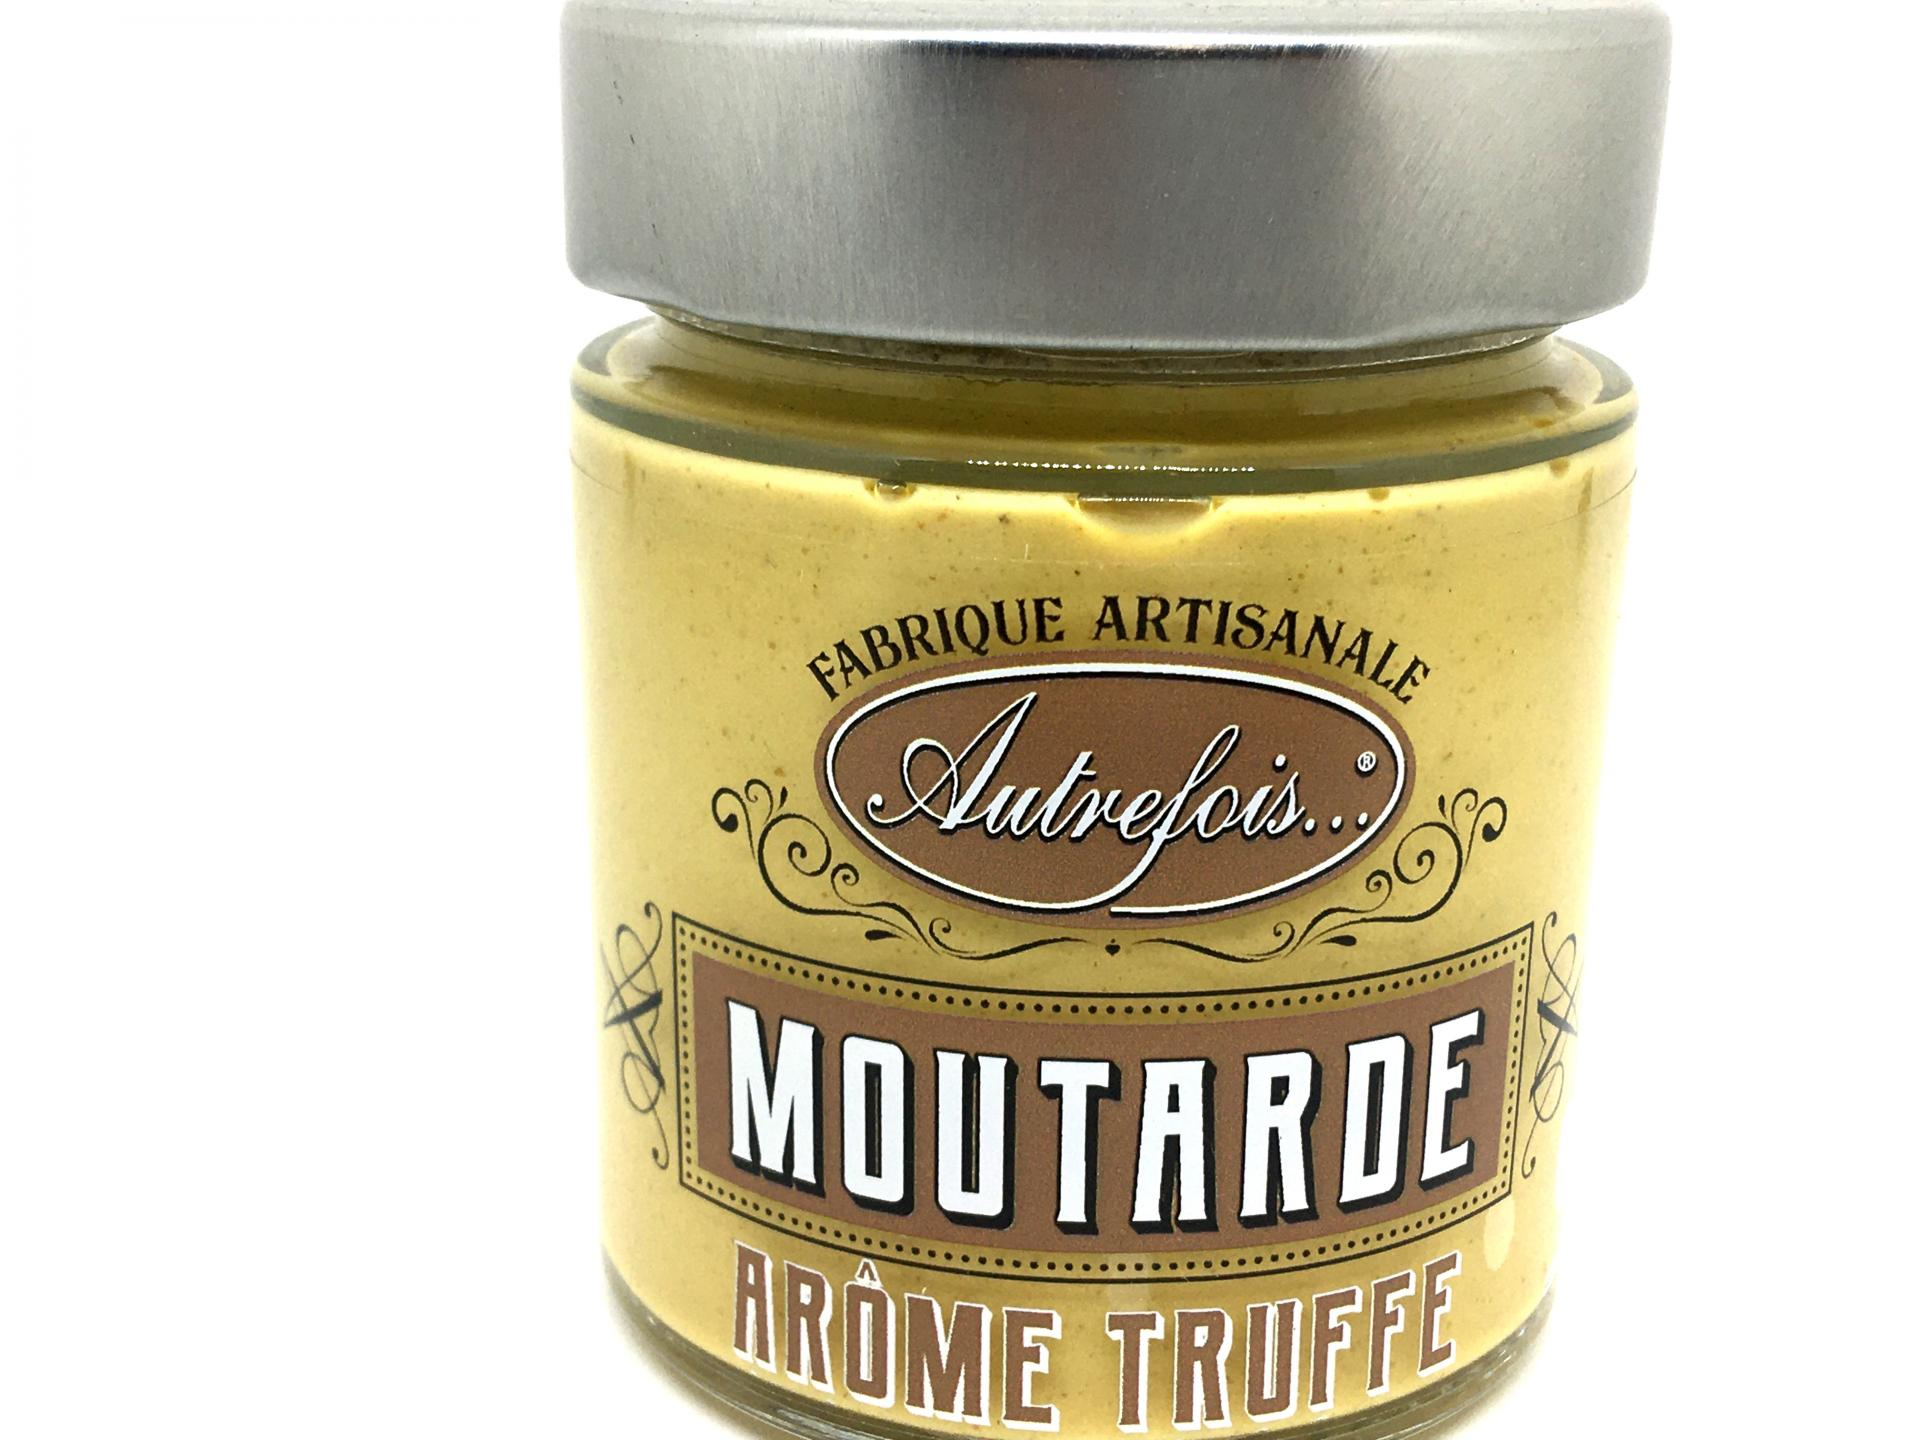 Moutarde aromatisee a la truffe 130g autrefois terroir milhaud gard